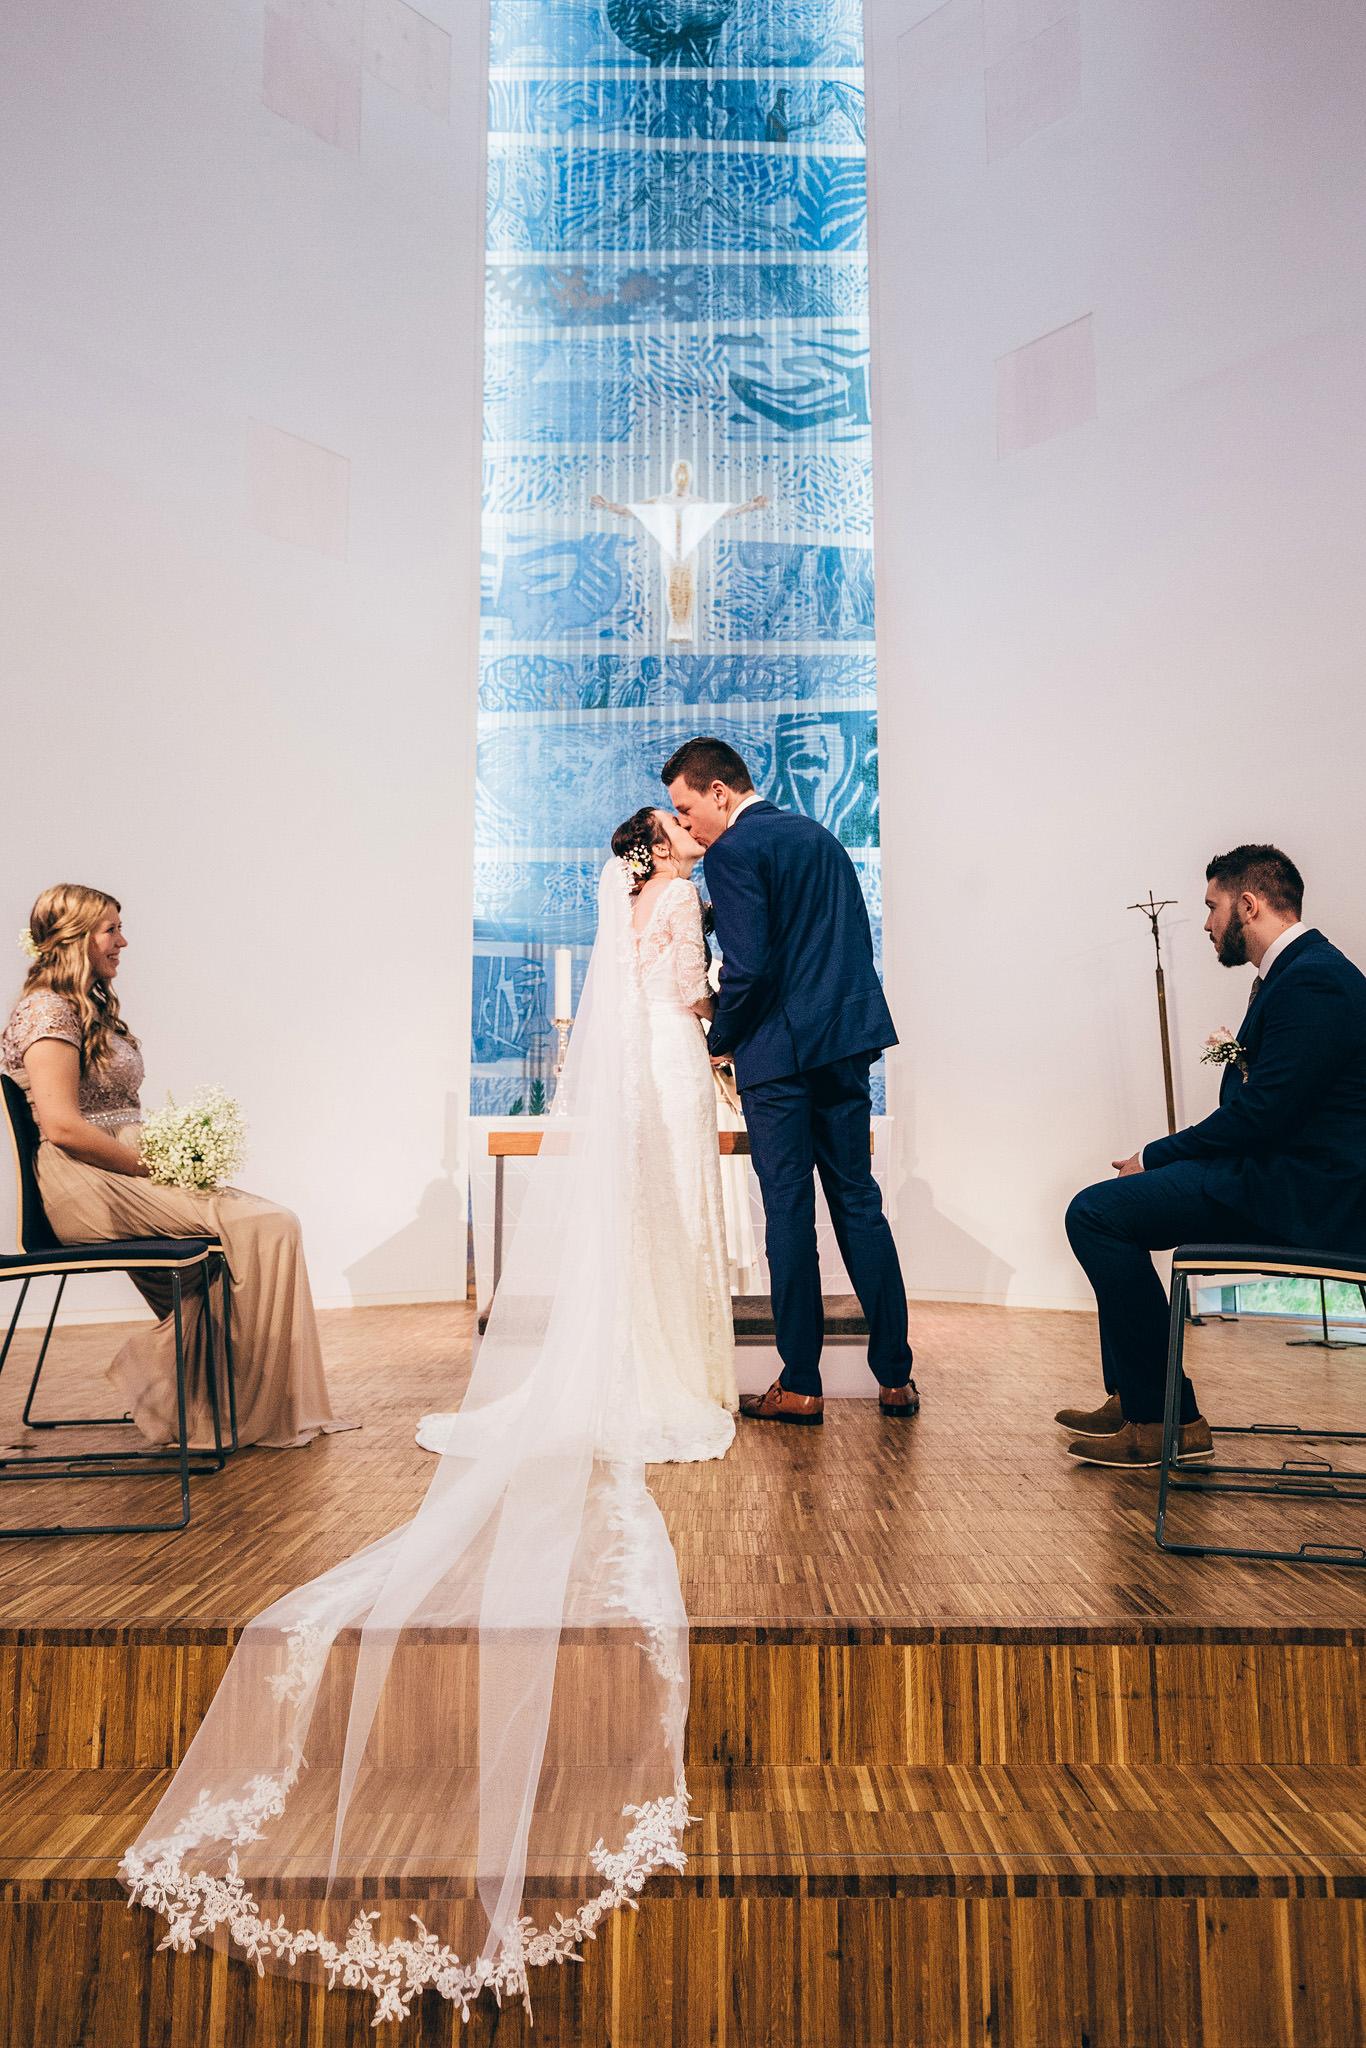 Norway+wedding+photographer+elopement+pre+wedding+Casey+Arneson-39.jpg